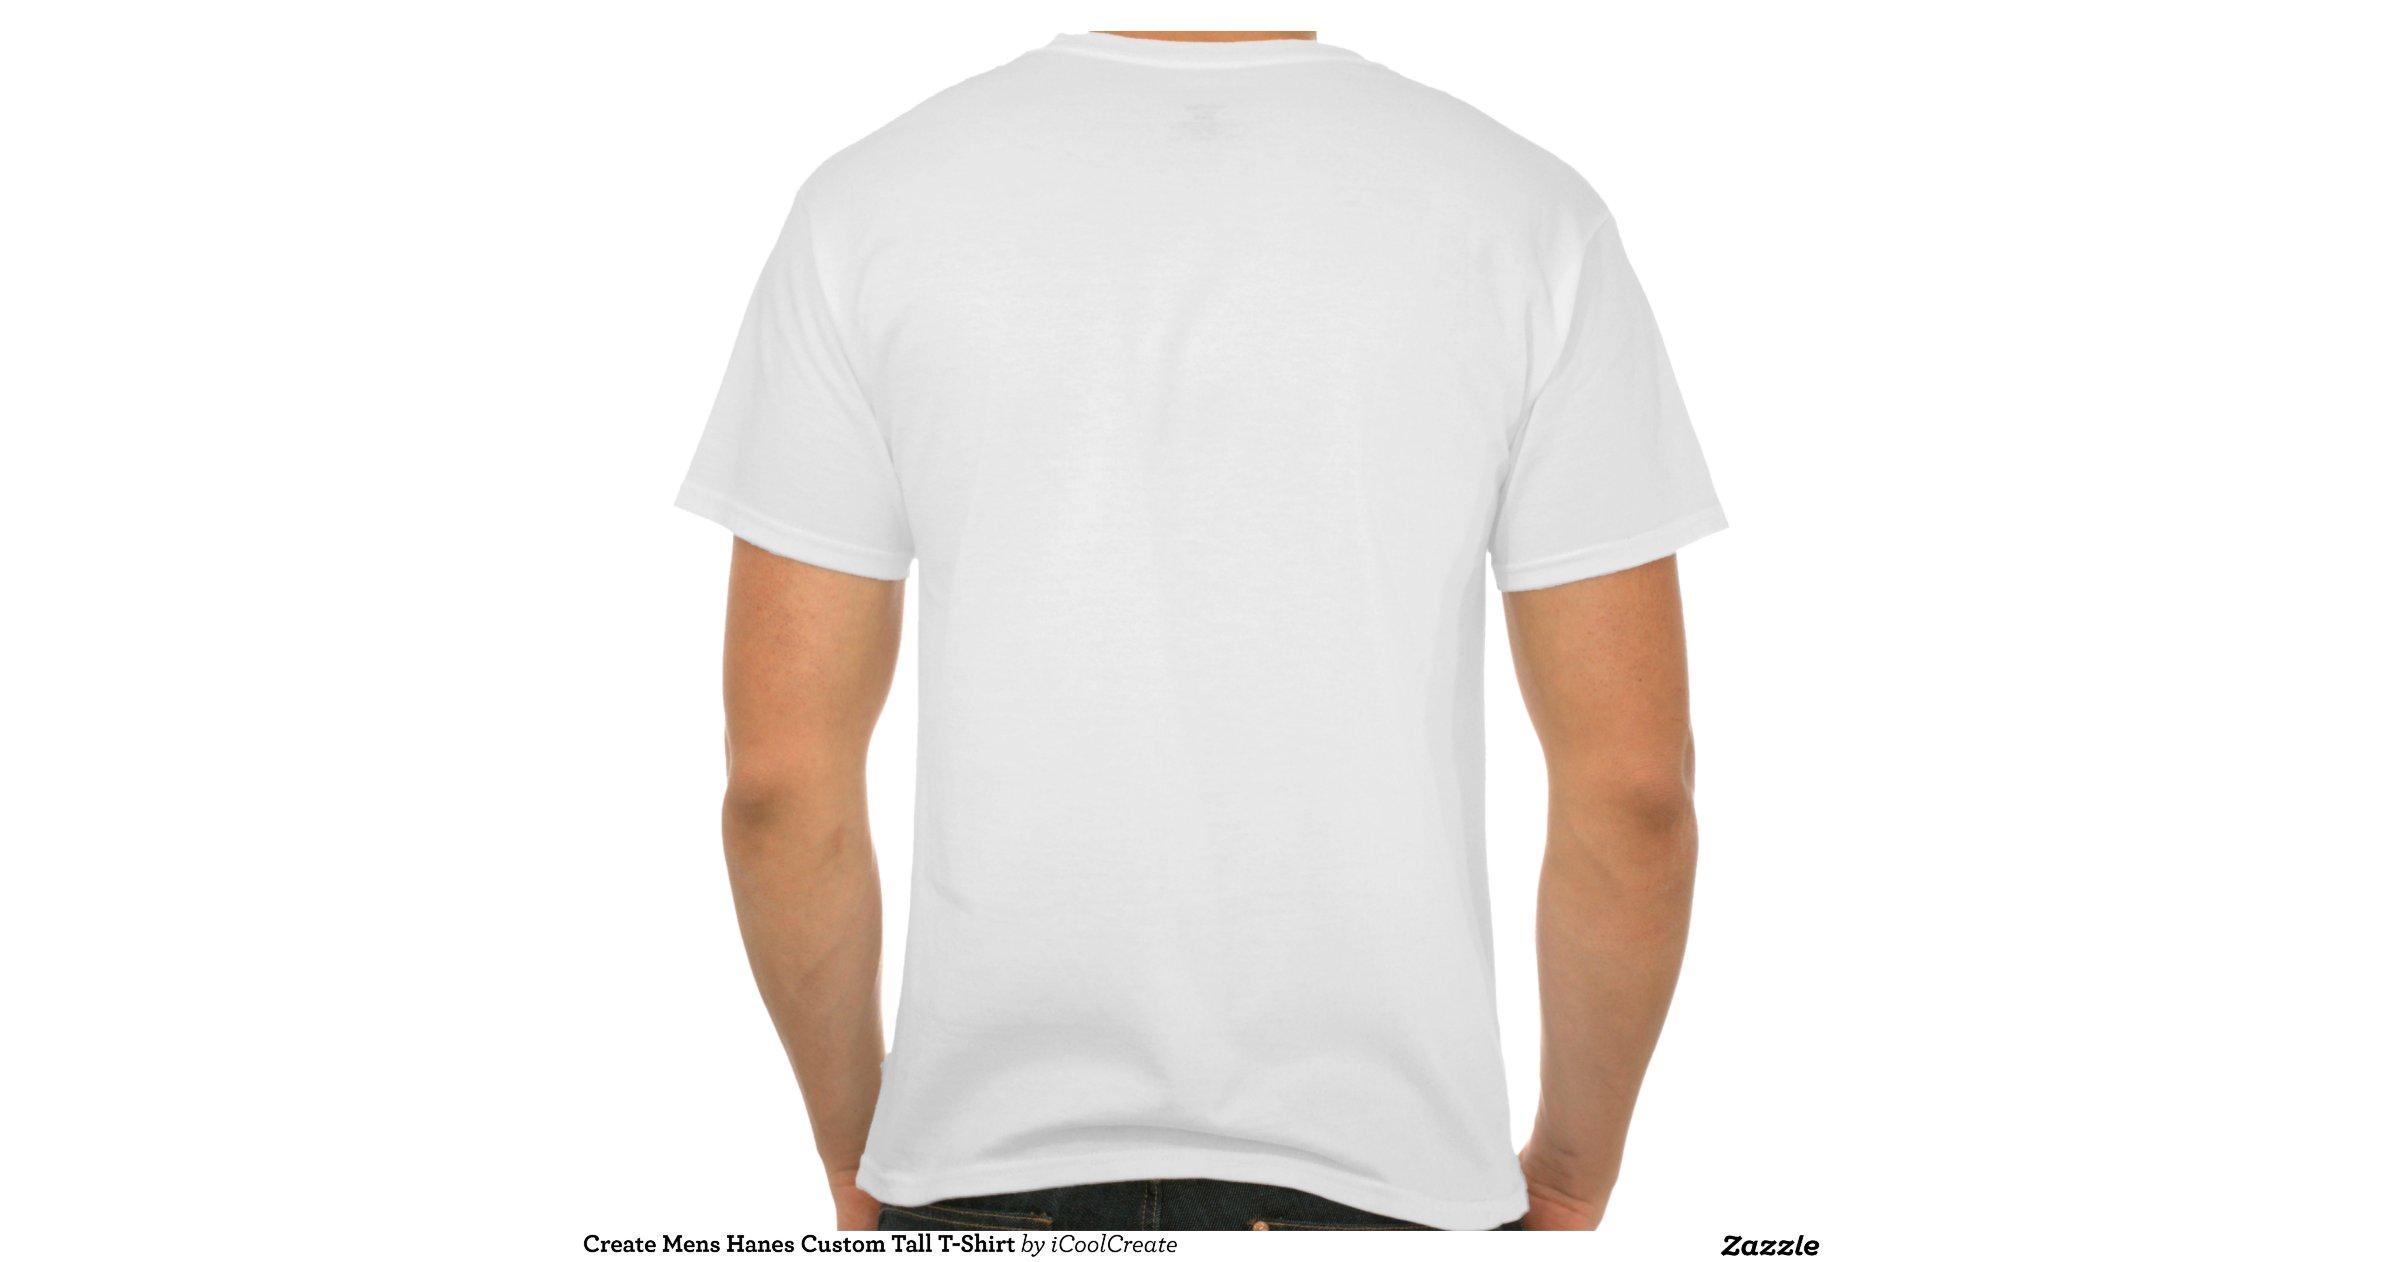 create mens hanes custom tall t shirt